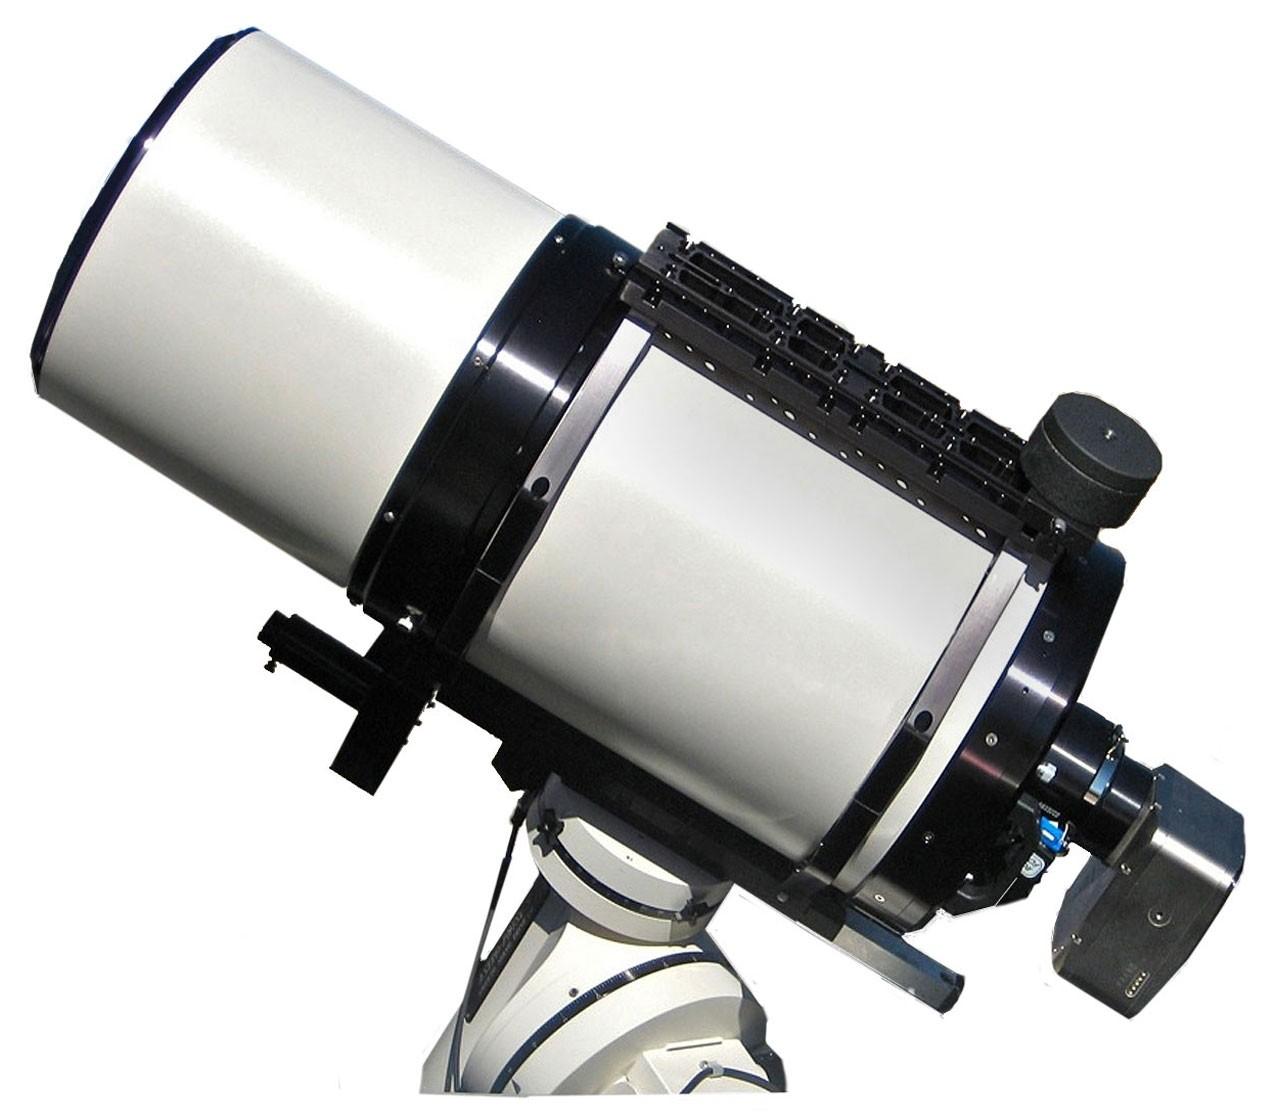 Astro-Physics 305 mm f/3.8 Riccardi-Honders Astrograph